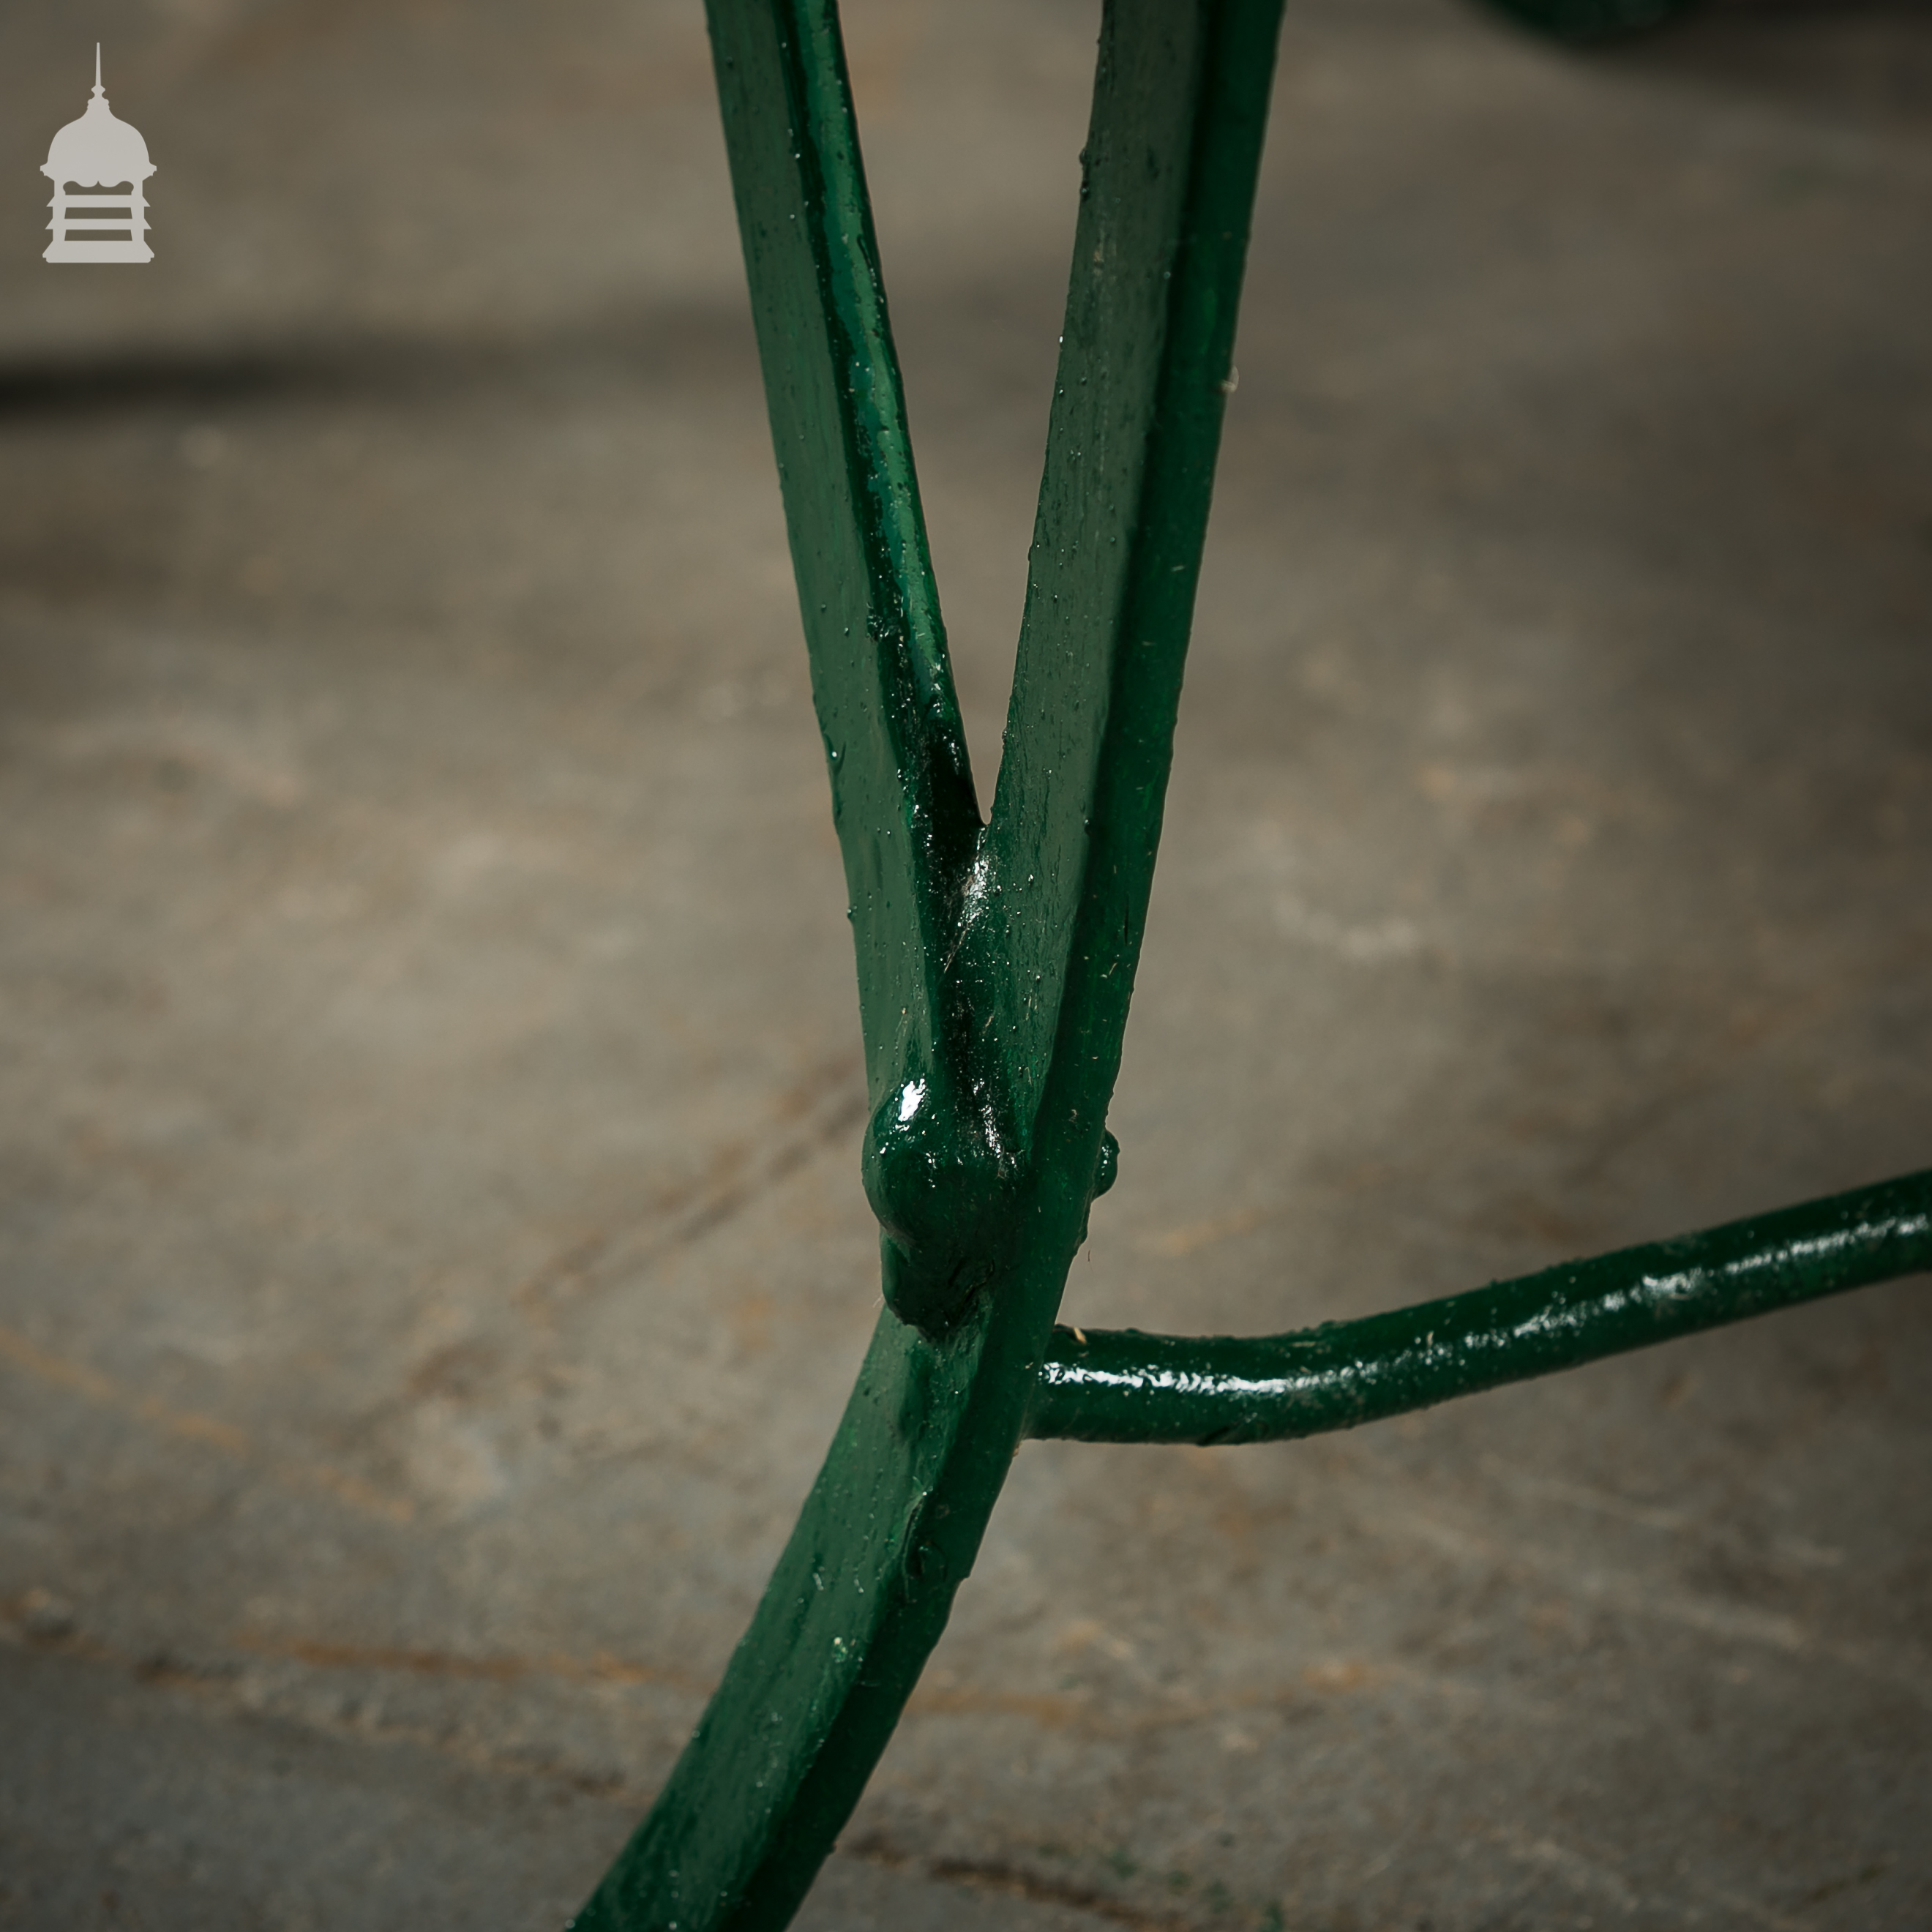 4 Wrought Iron Garden Chairs with Hardwood Slats 7